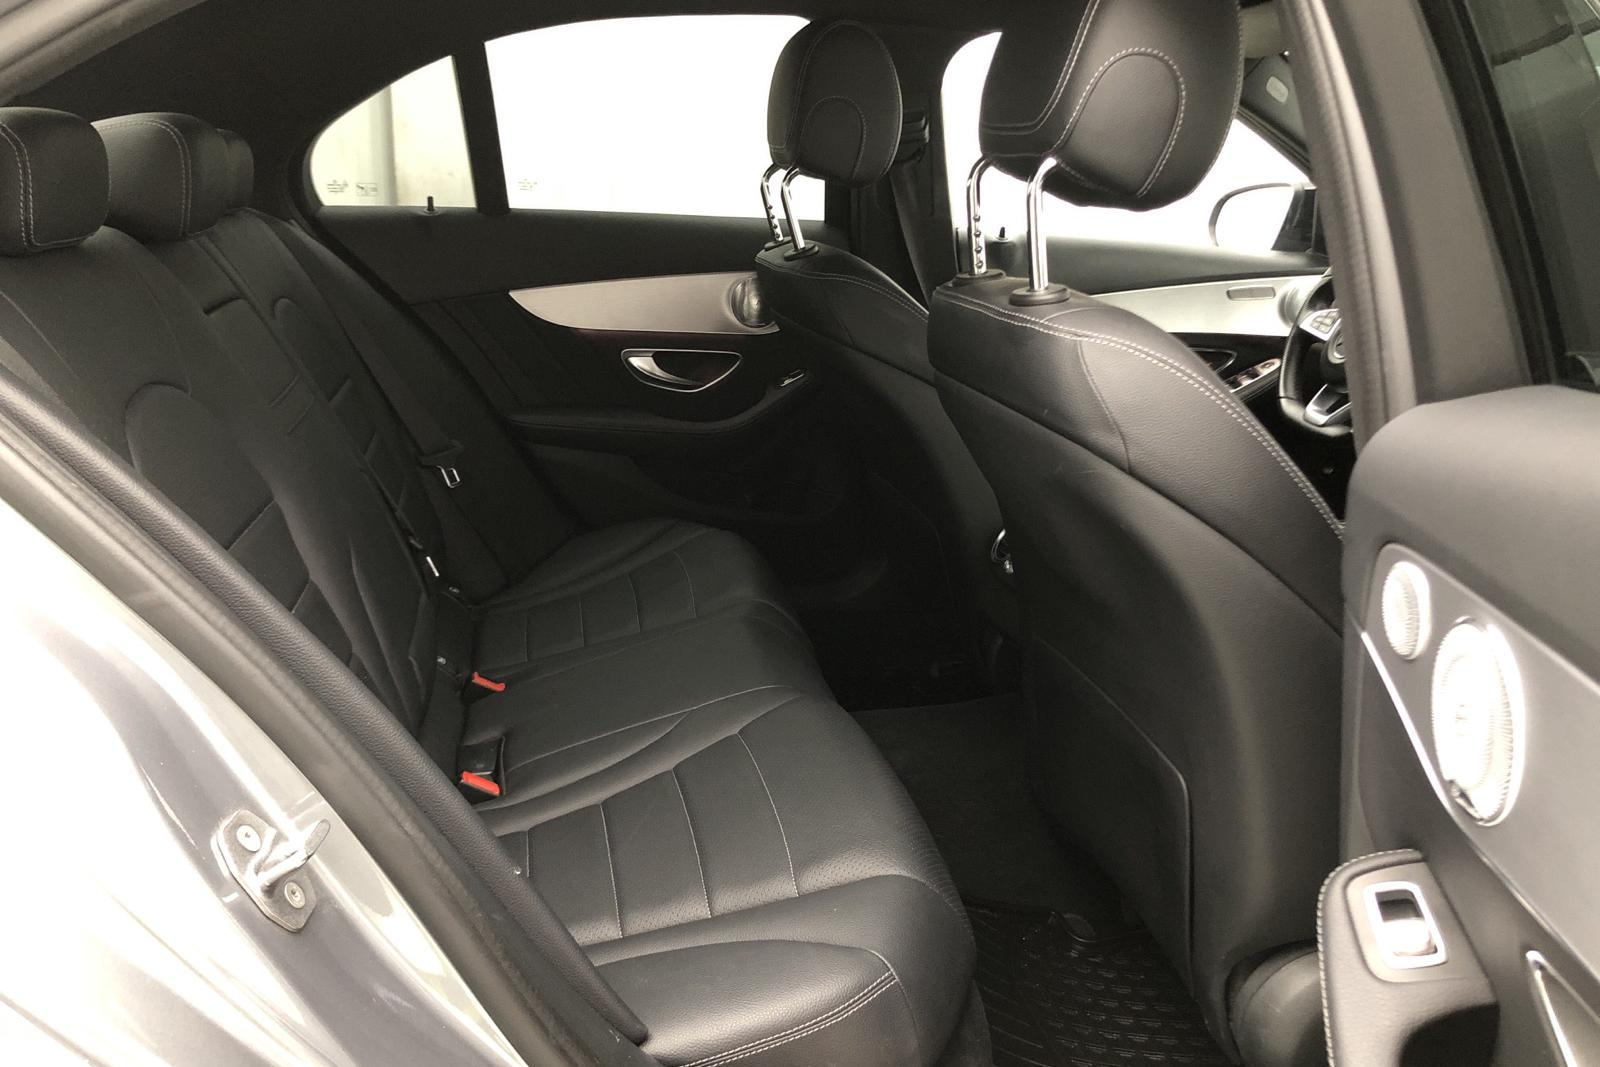 Mercedes C 220 d 4MATIC W205 (170hk) - 19 700 mil - silver - 2017